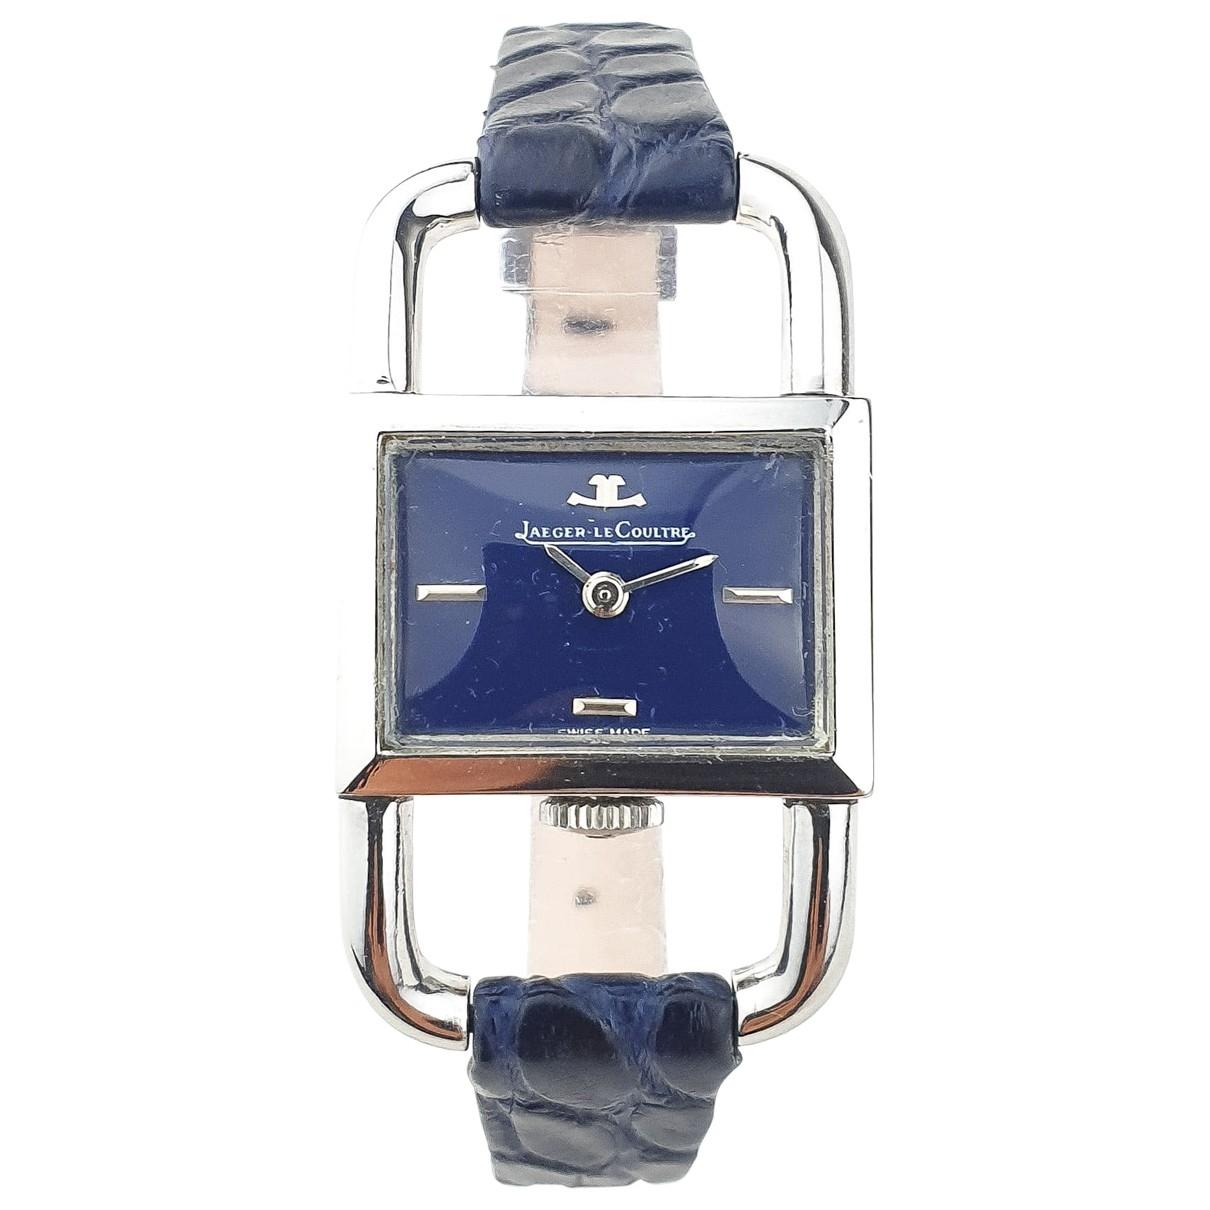 Jaeger-lecoultre Etrier Uhr in  Blau Stahl